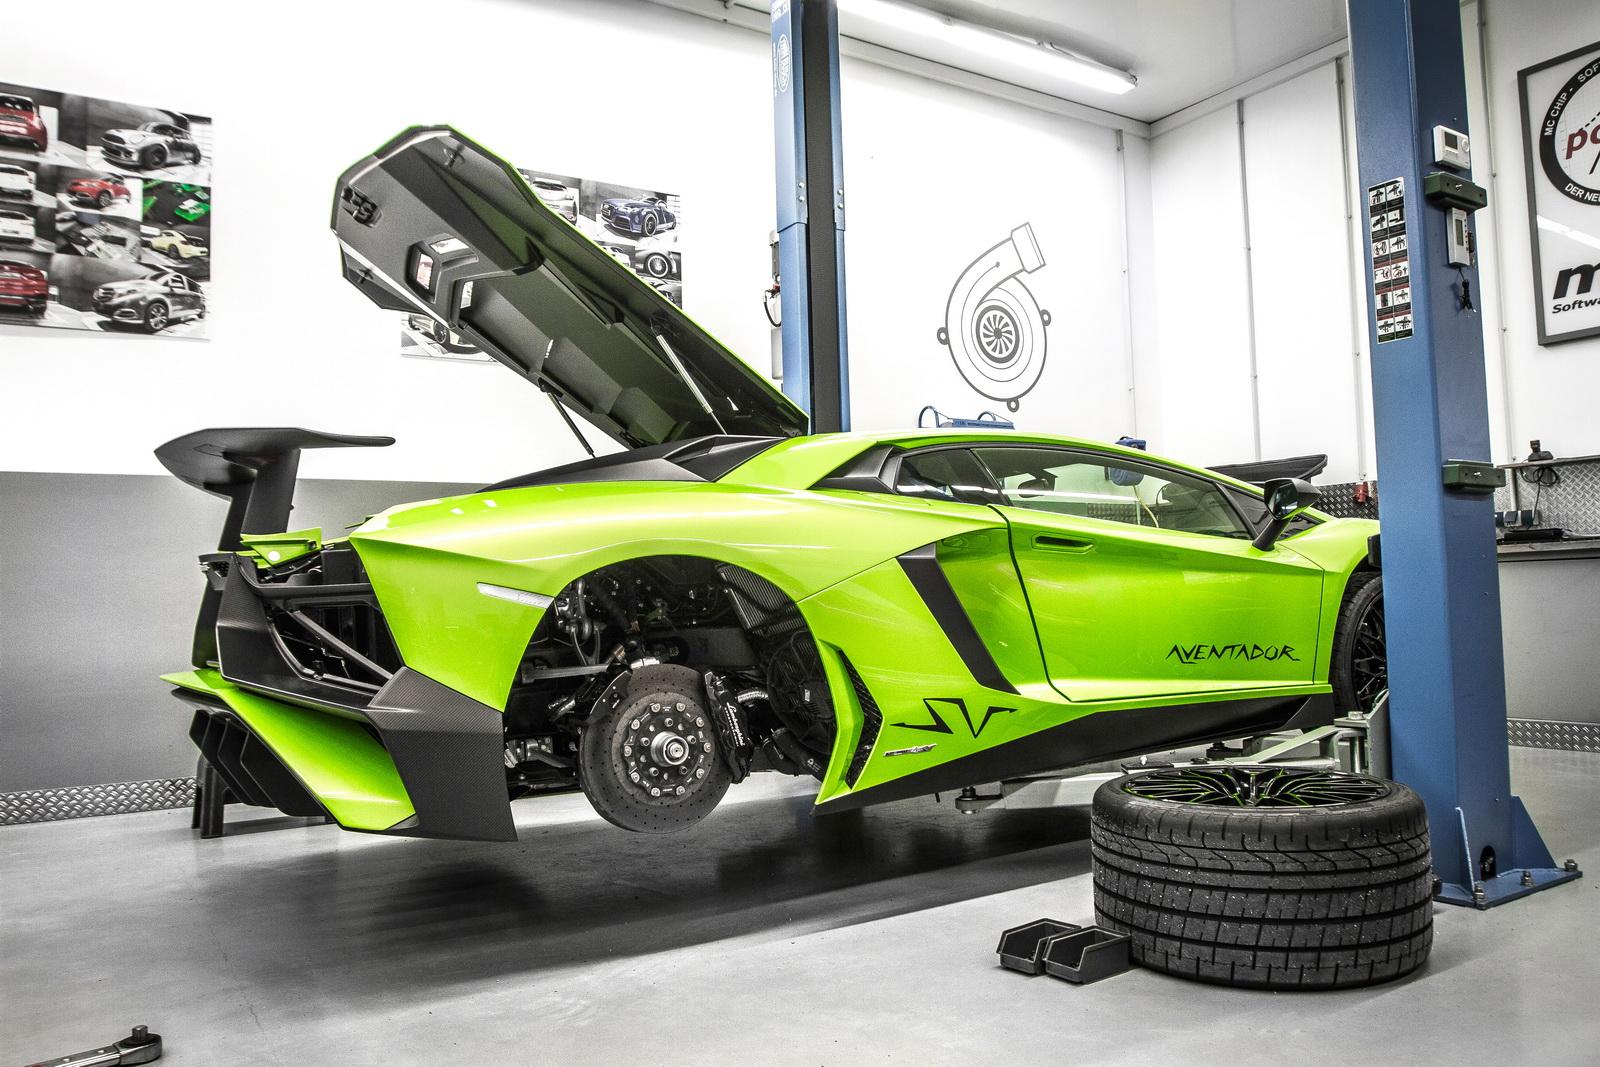 Lamborghini_Aventador_SV_by_Mcchip-DKR_04